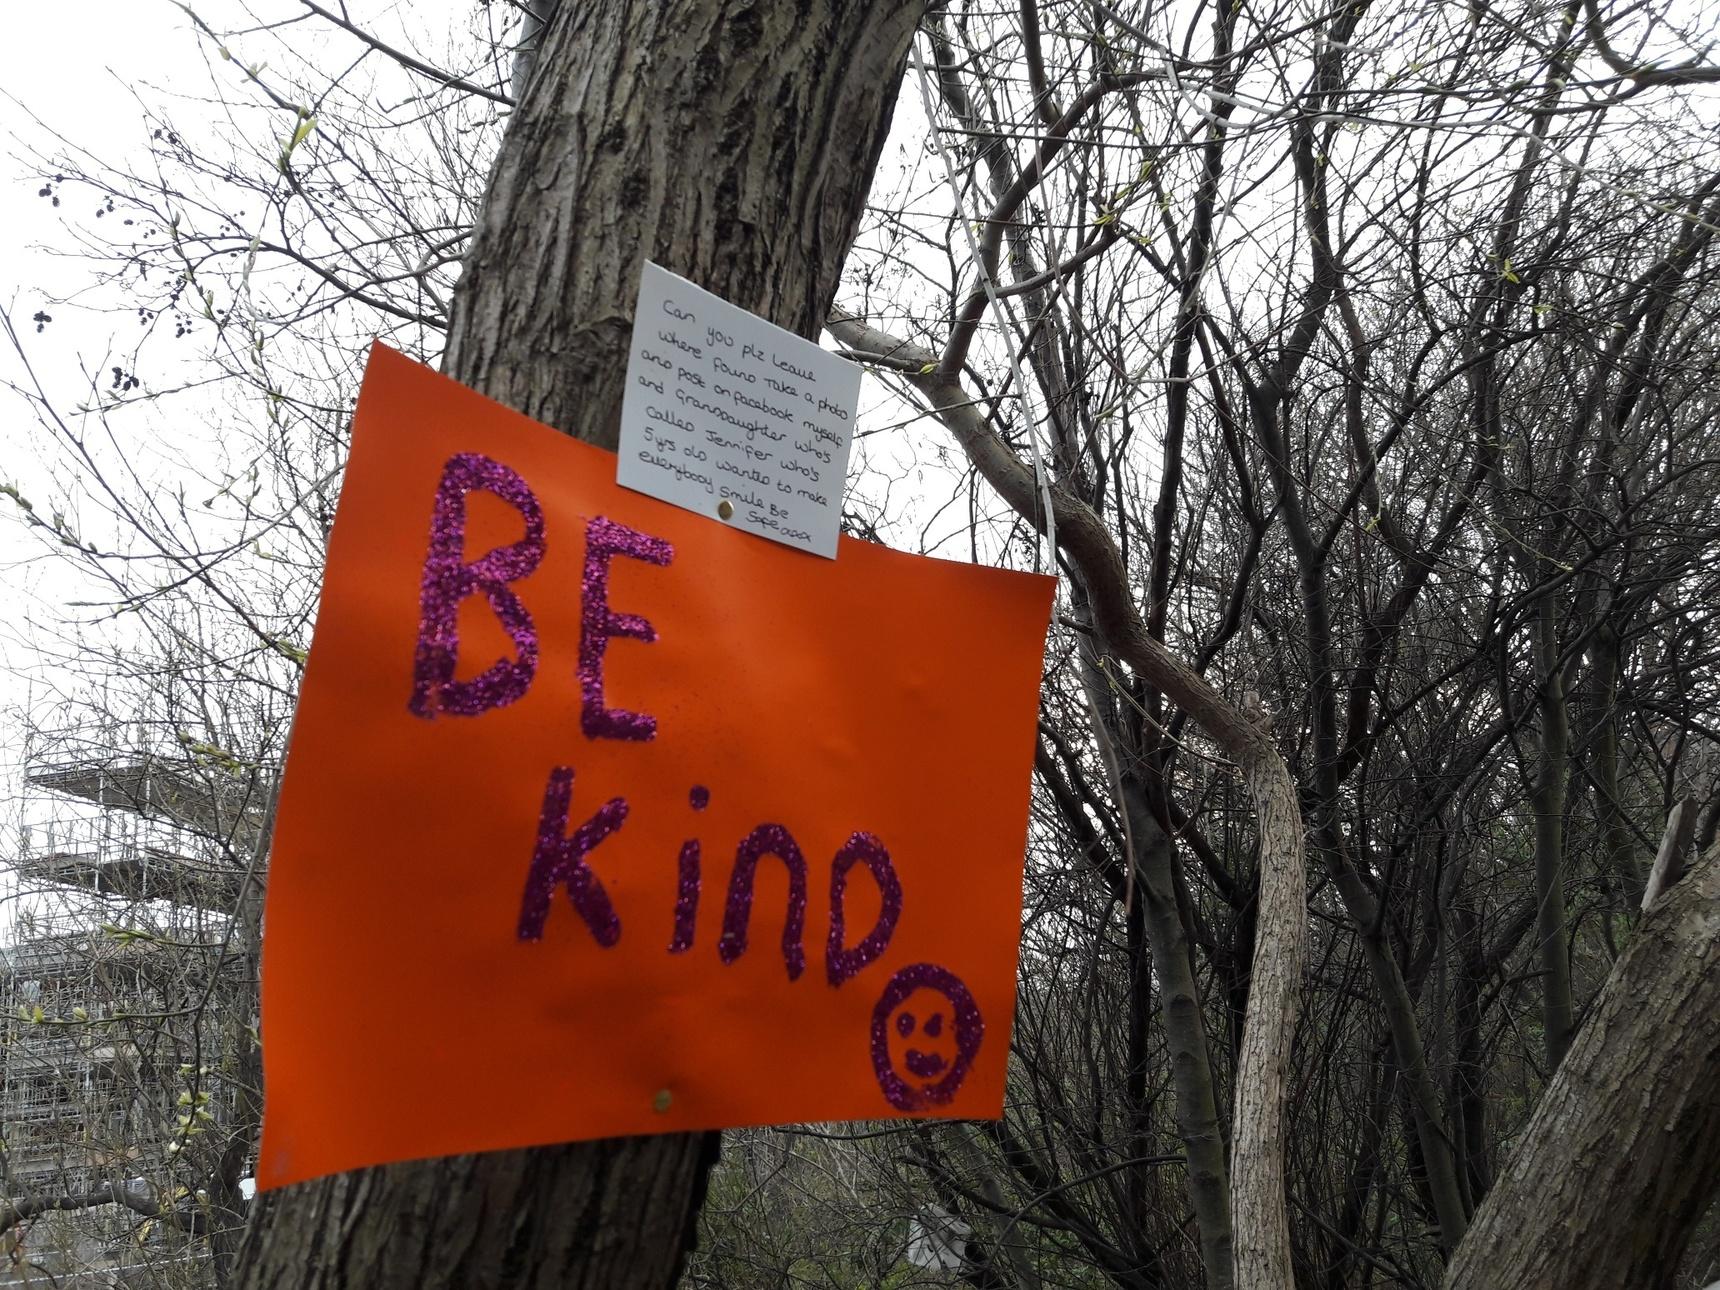 Guerilla art work - Be kind